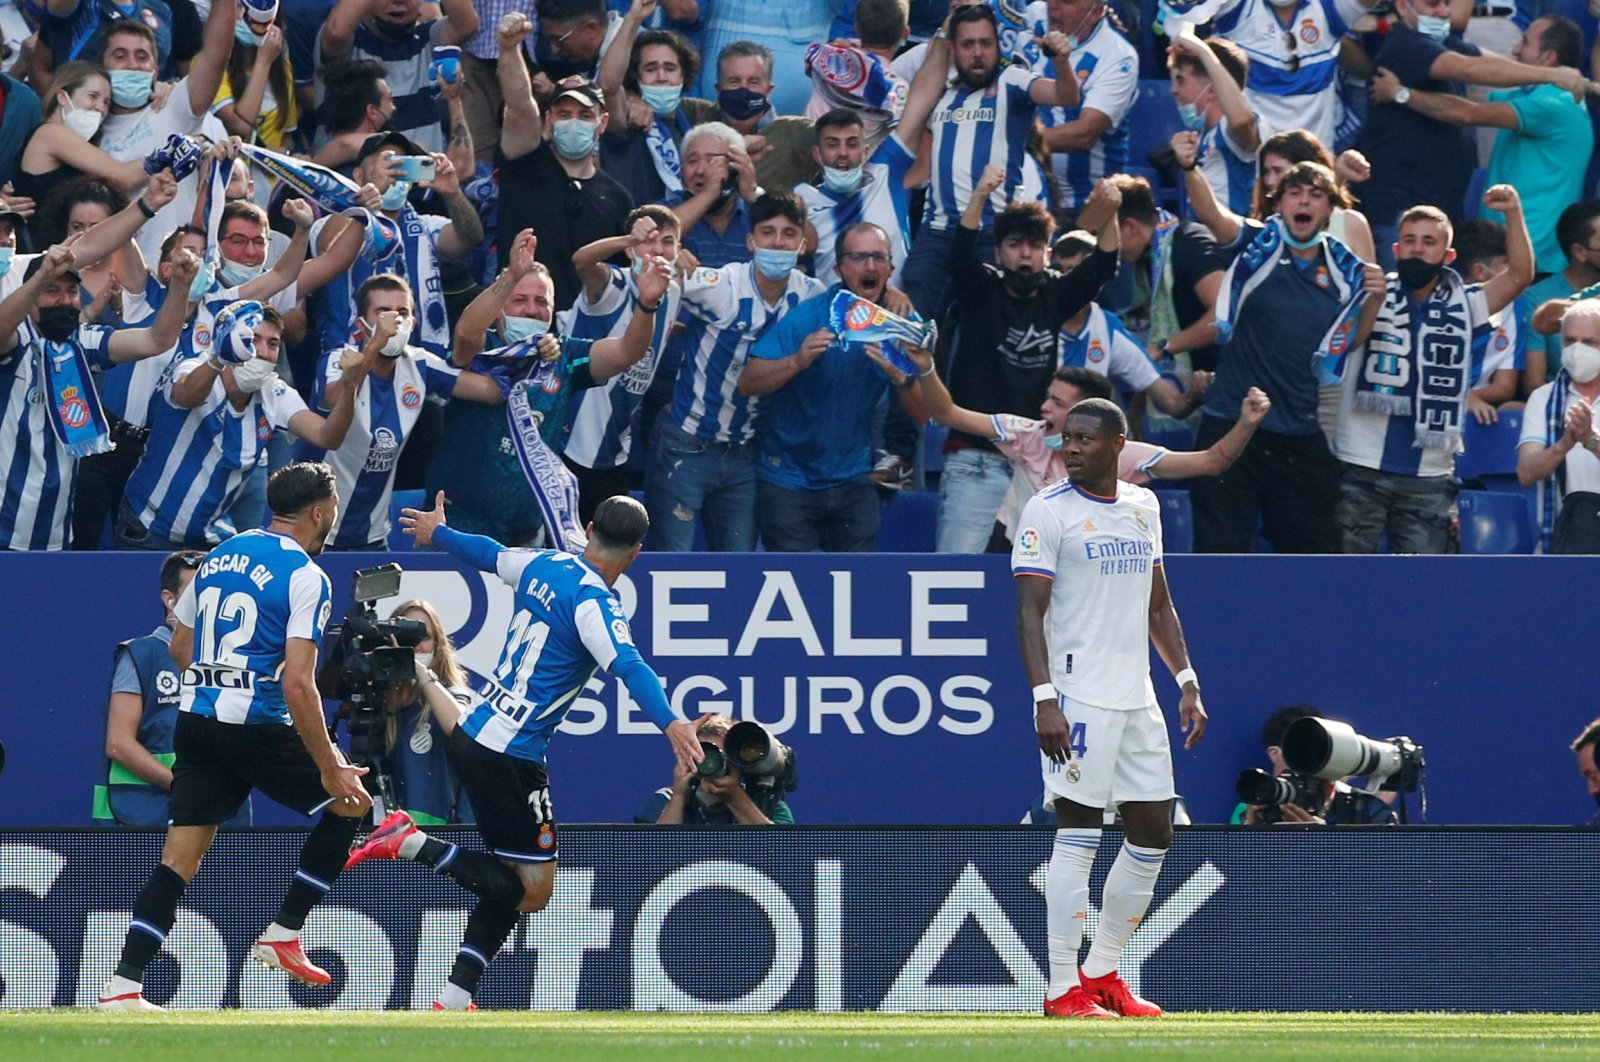 Espanyol's Raul de Tomas (C) celebrates a goal duıring a La Liga match against Real Madrid at the Cornella-El Prat stadium in Barcelona, Spain, Oct. 3, 2021. (Reuters Photo)